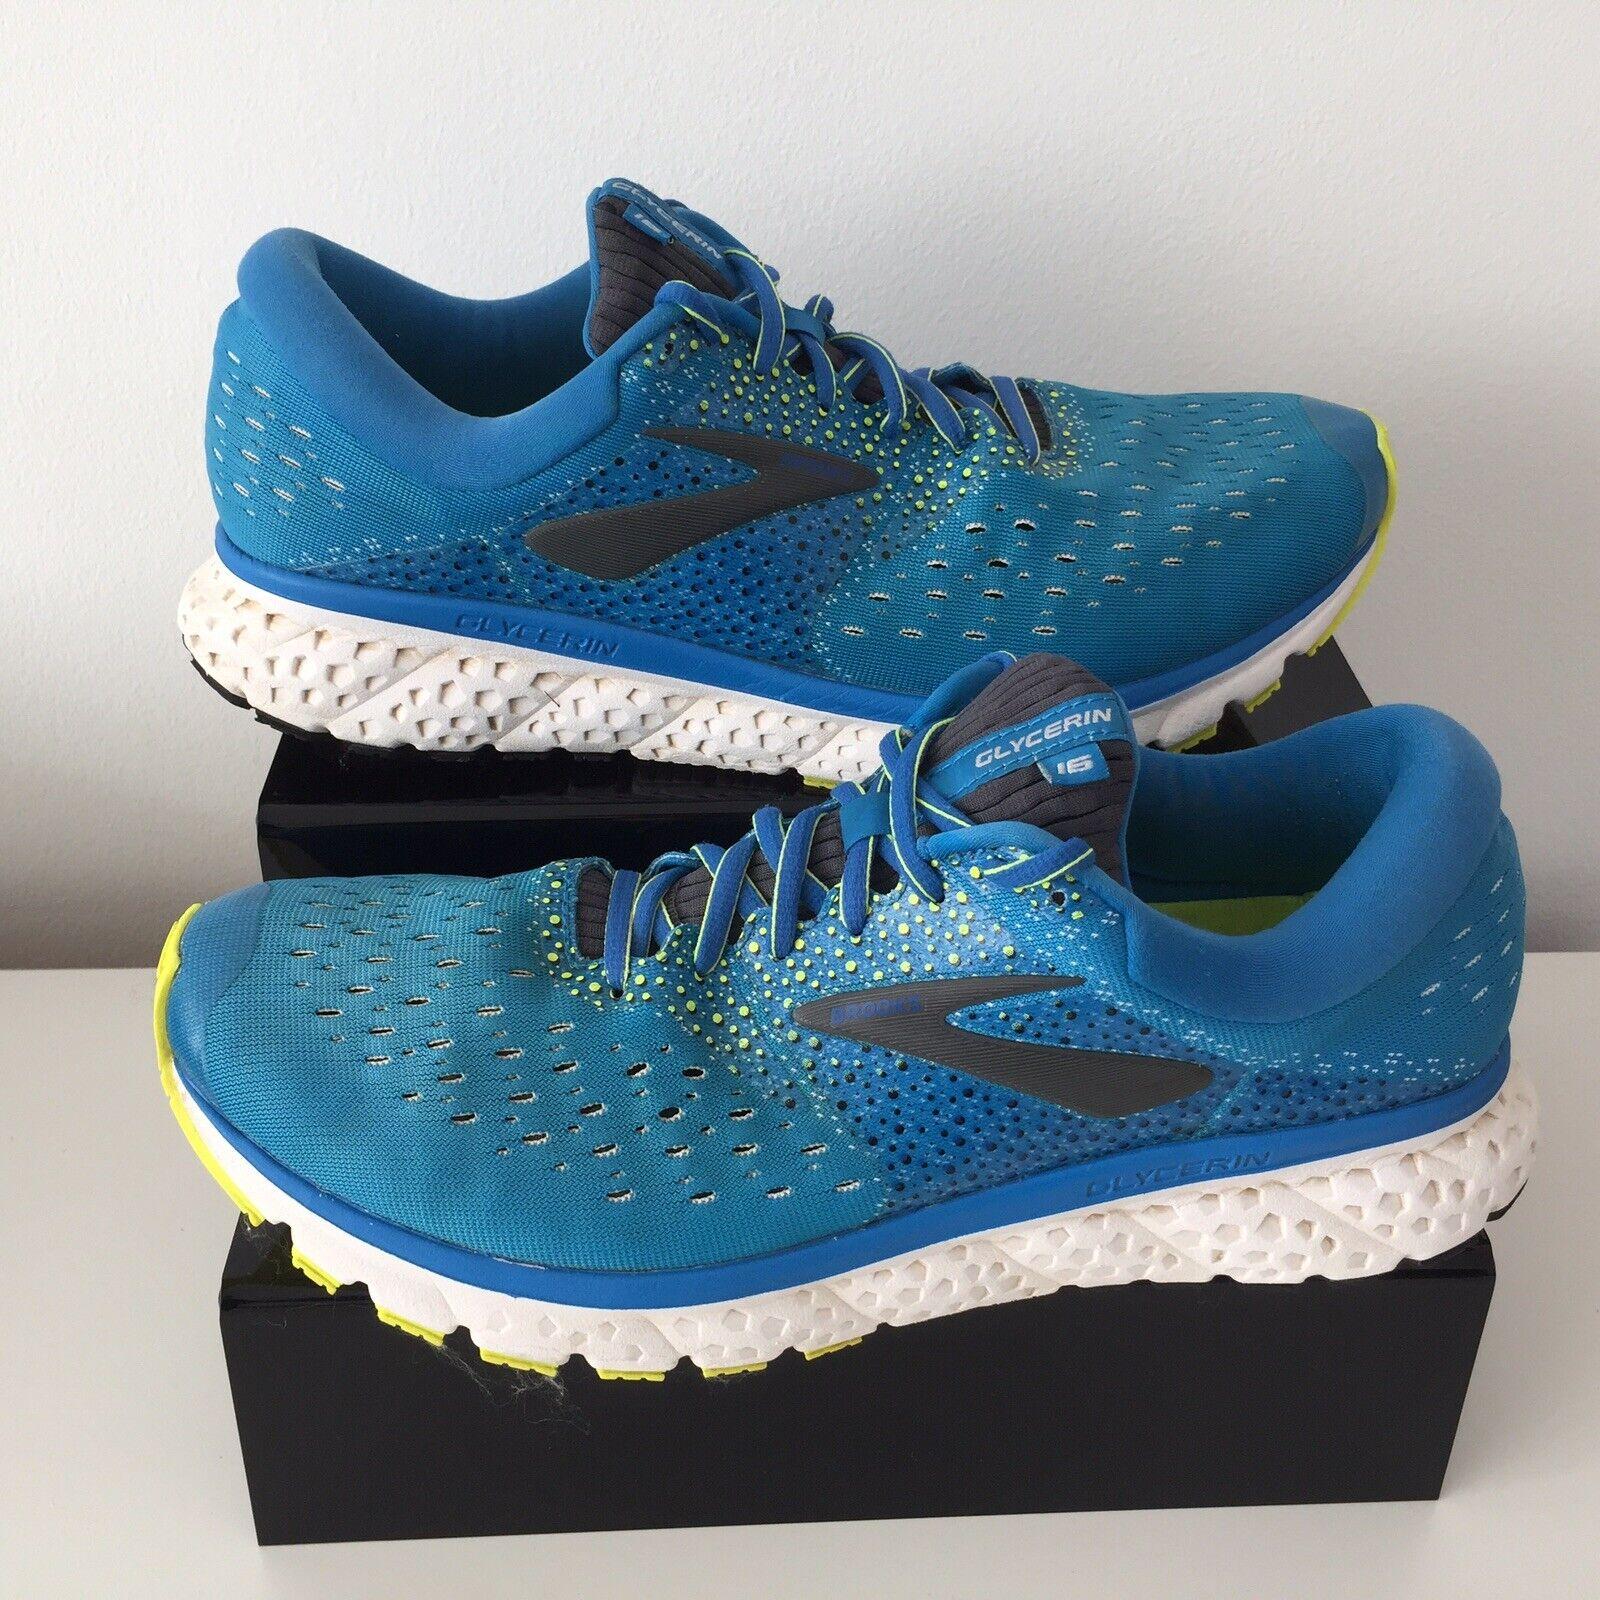 BROOKS GLYCERIN 16 Blau Running Trainers schuhe Men`s Größe UK 12 Medium EUR 47.5